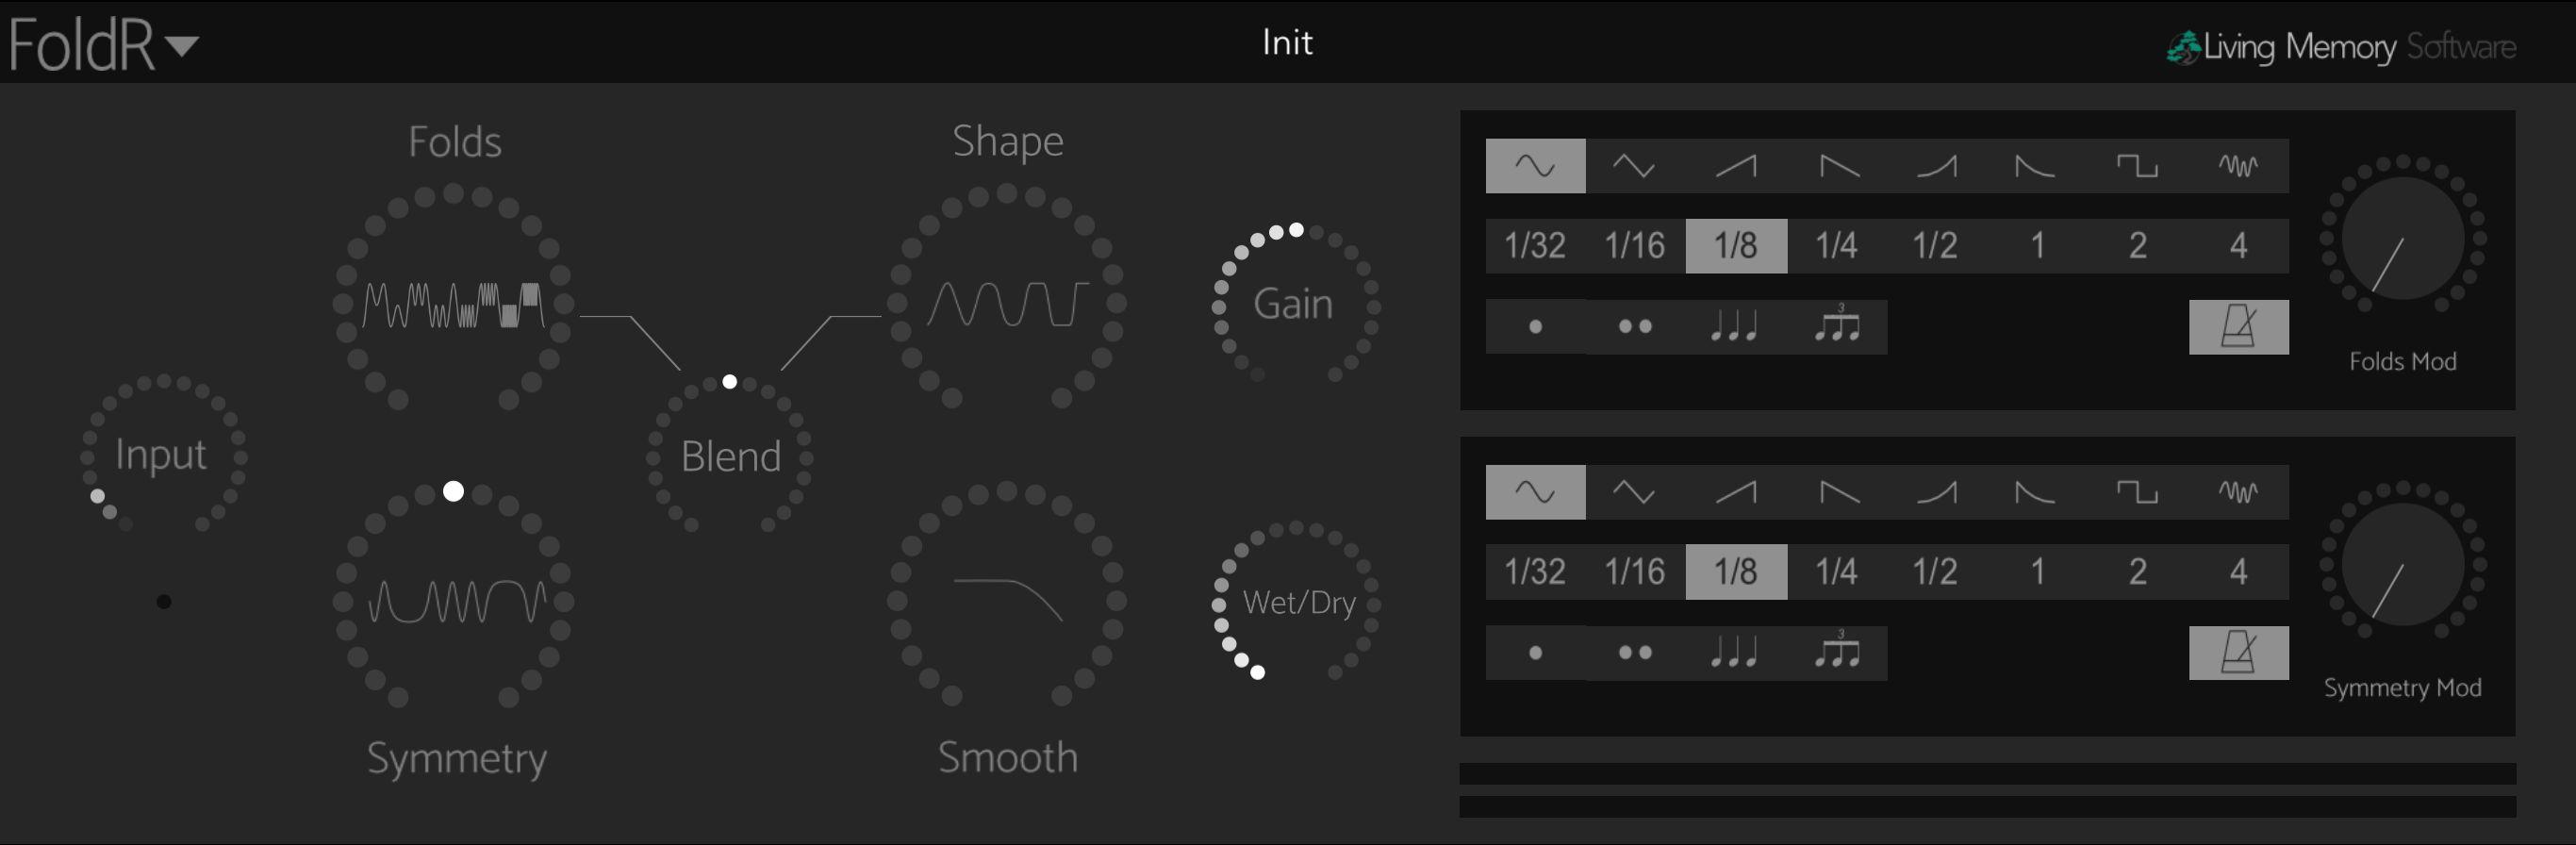 FoldR interface.